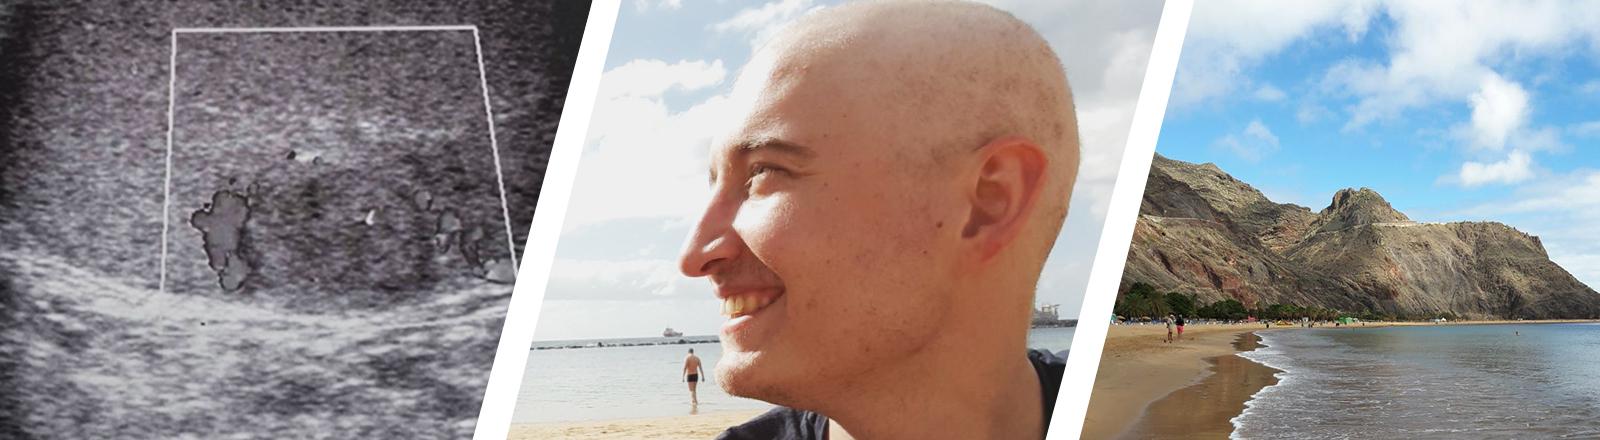 Ultraschallbild Hodenkrebs; Porträt Kolja Unger, Teneriffa